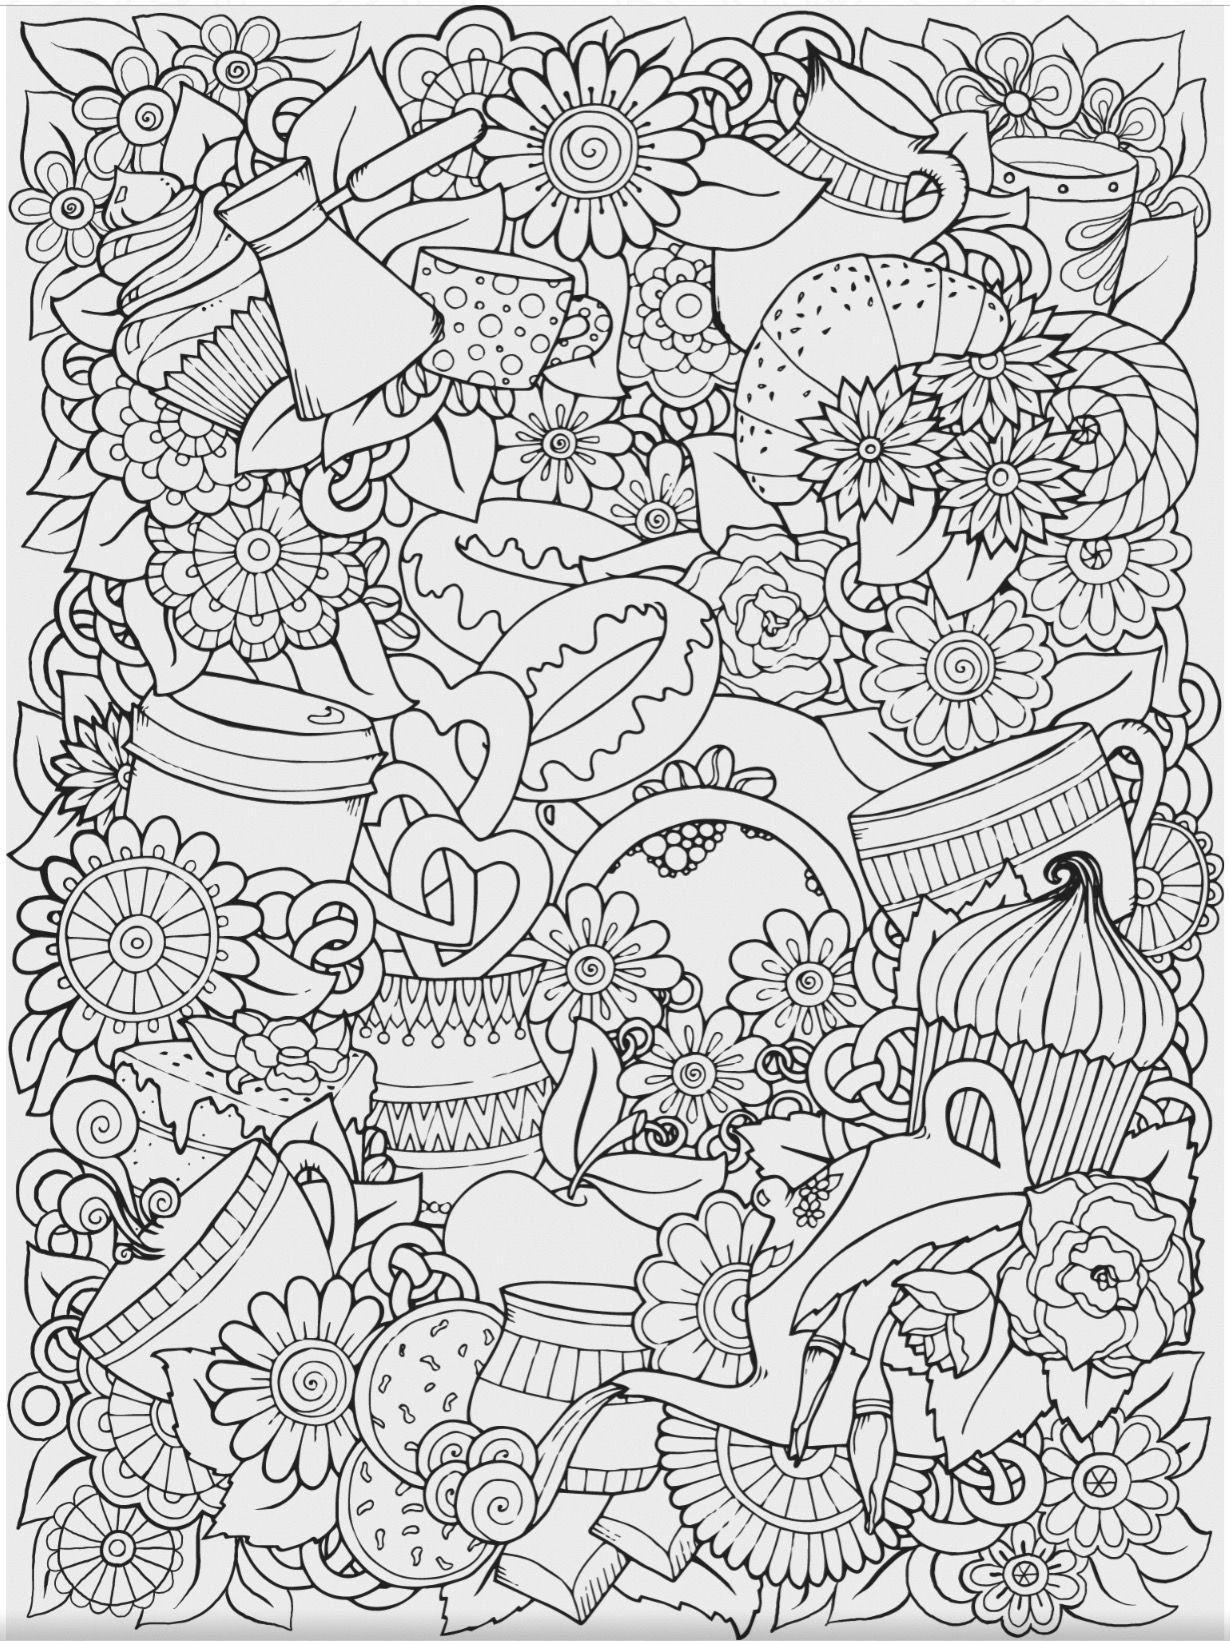 Pin von Carol Ratliff auf Relax! Color Cinco! | Pinterest | Ausmalbilder